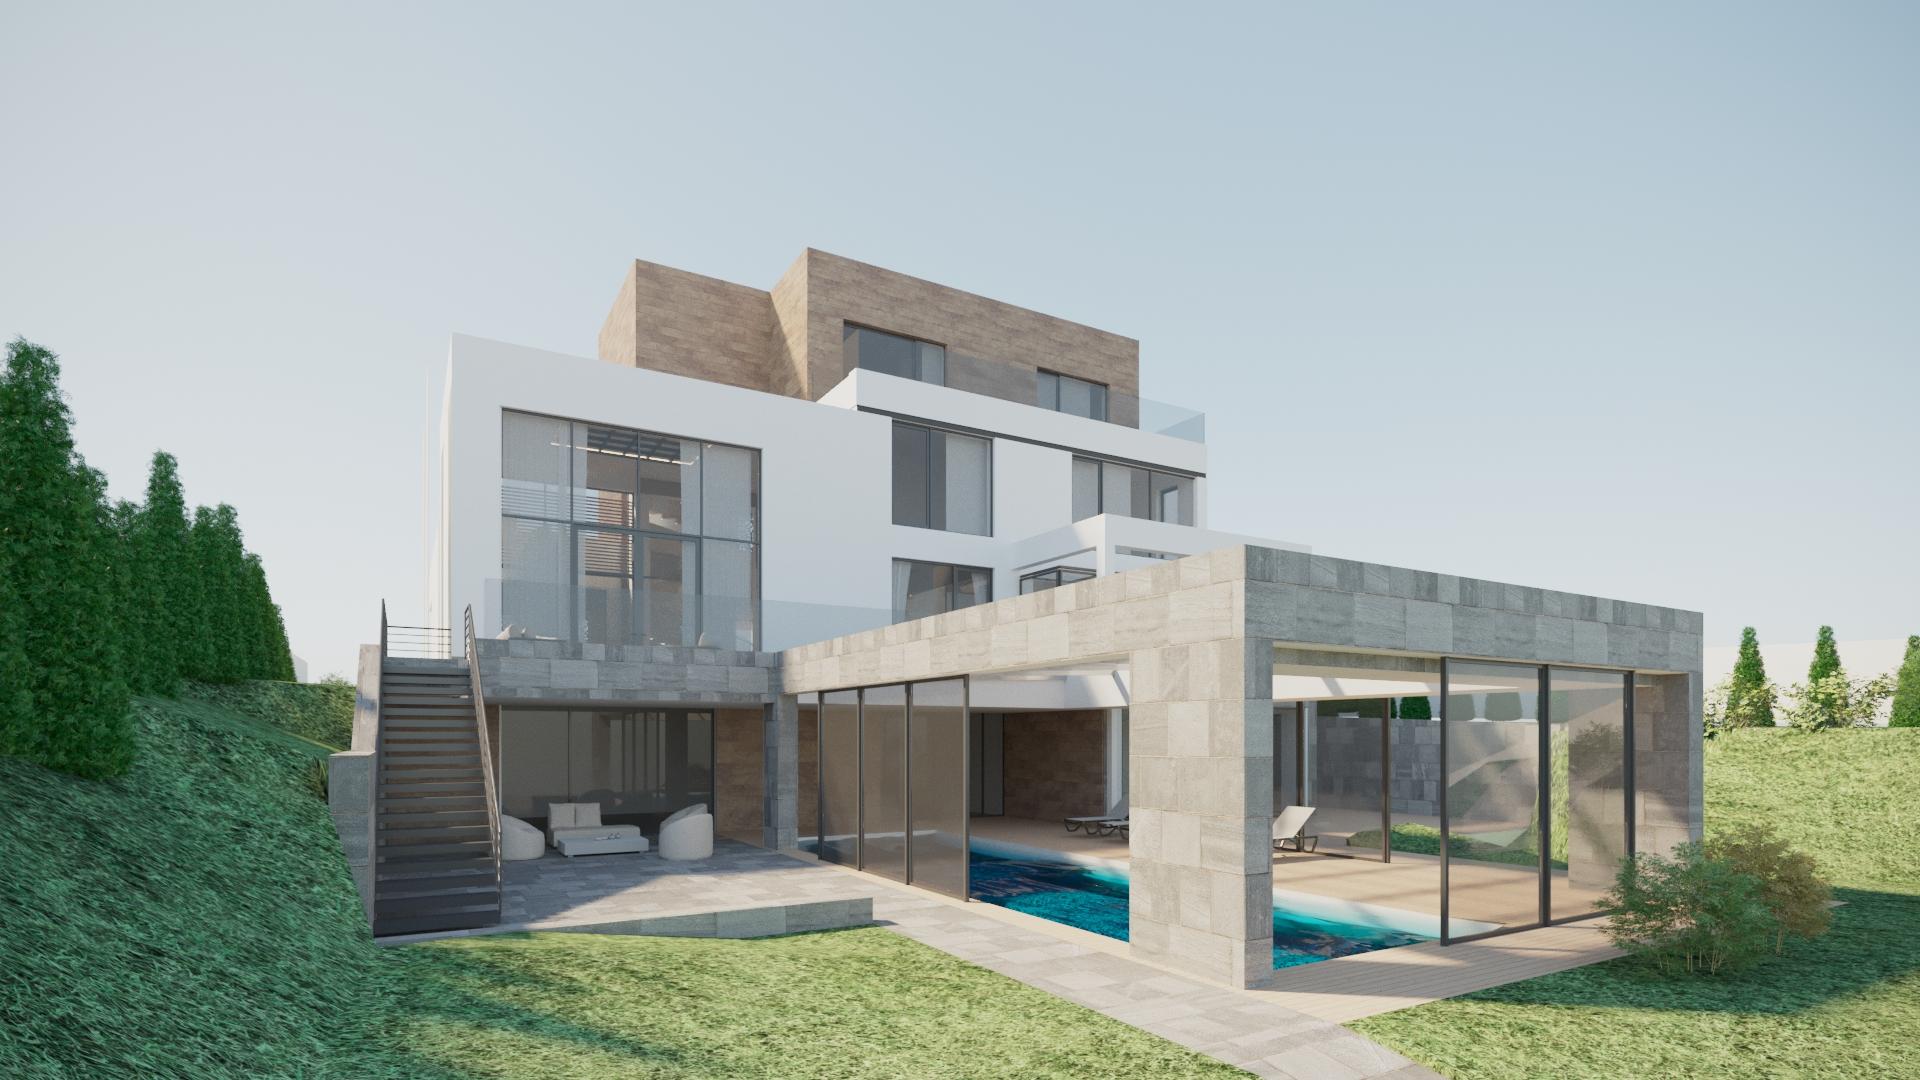 https://nbc-arhitect.ro/wp-content/uploads/2020/10/NBC-Arhitect-_-residences-_-Mogo-Villa-_-Romania-_-exterior-view_5.jpg